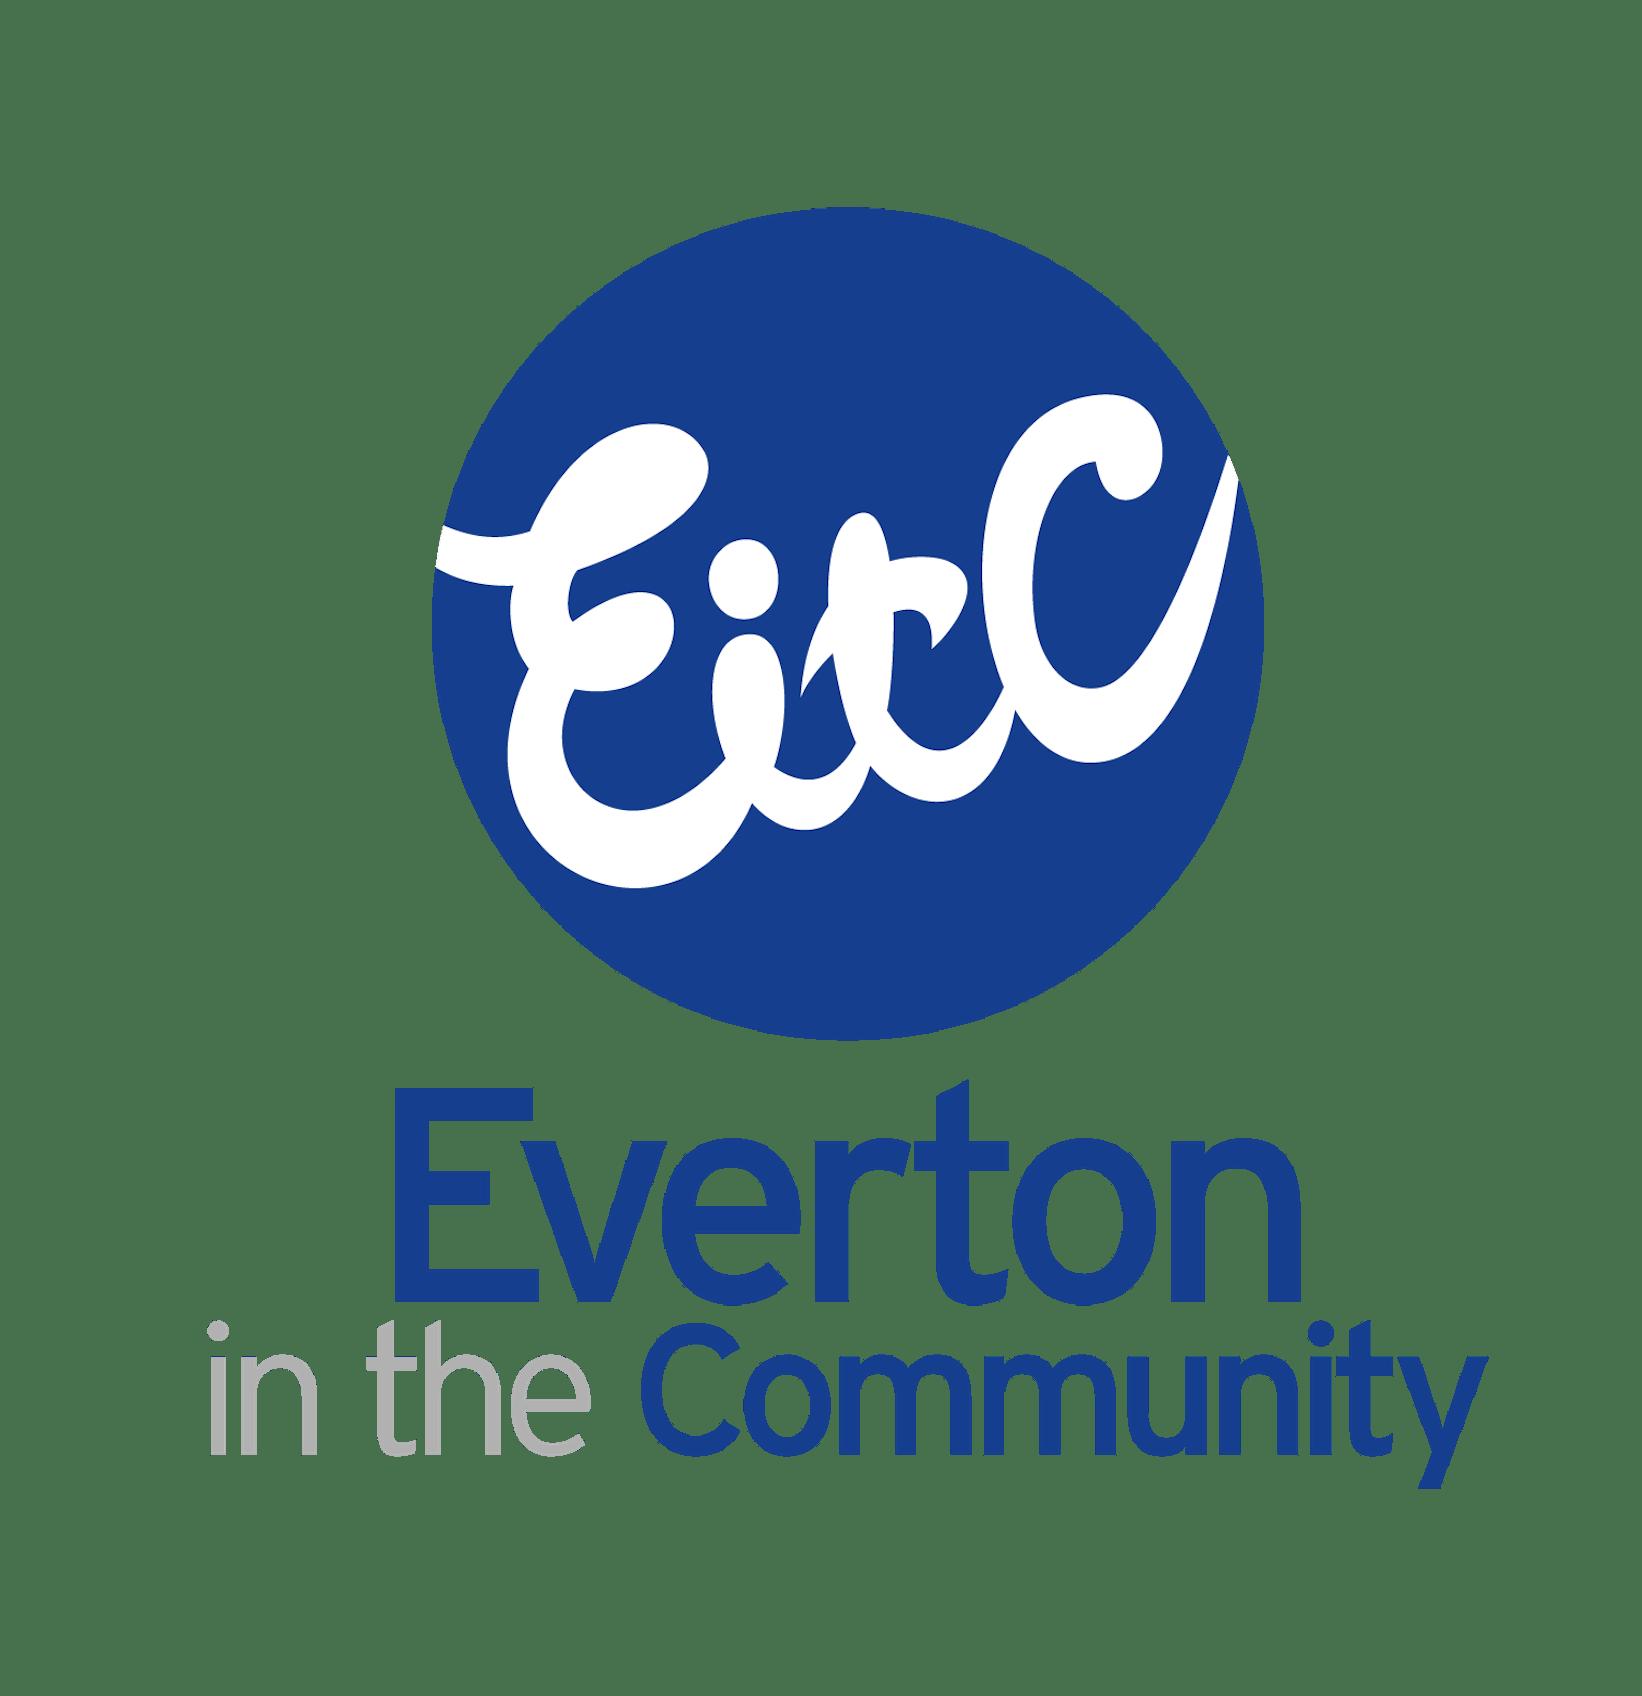 Everton in the Community (EitC)